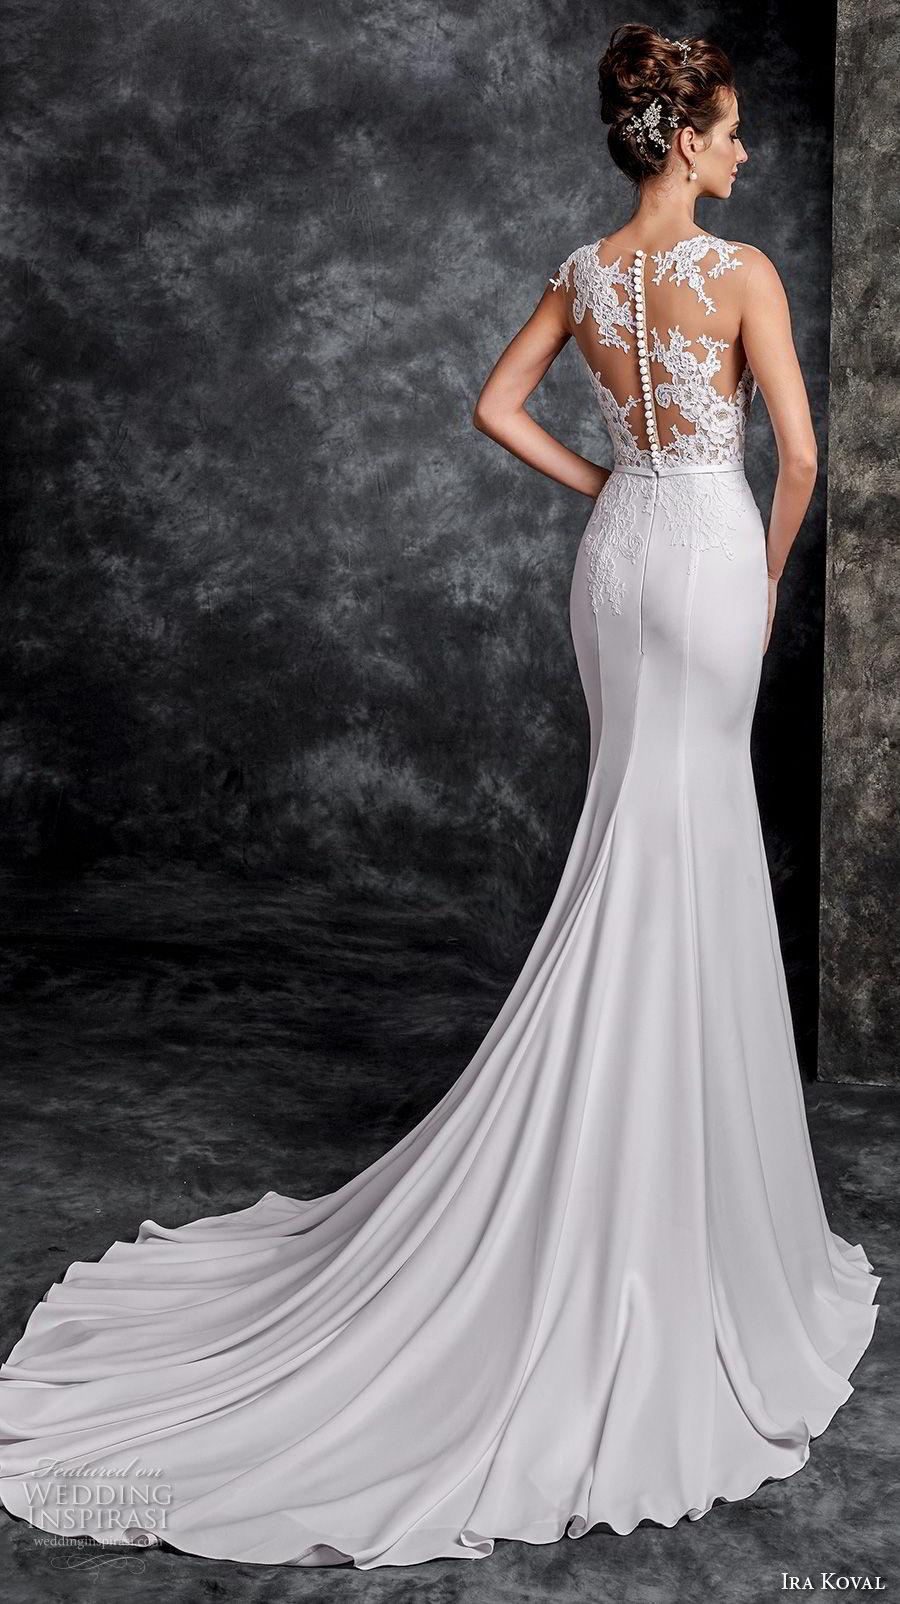 Ira koval 2017 wedding dresses wedding inspirasi page 2 for Lace button back wedding dress